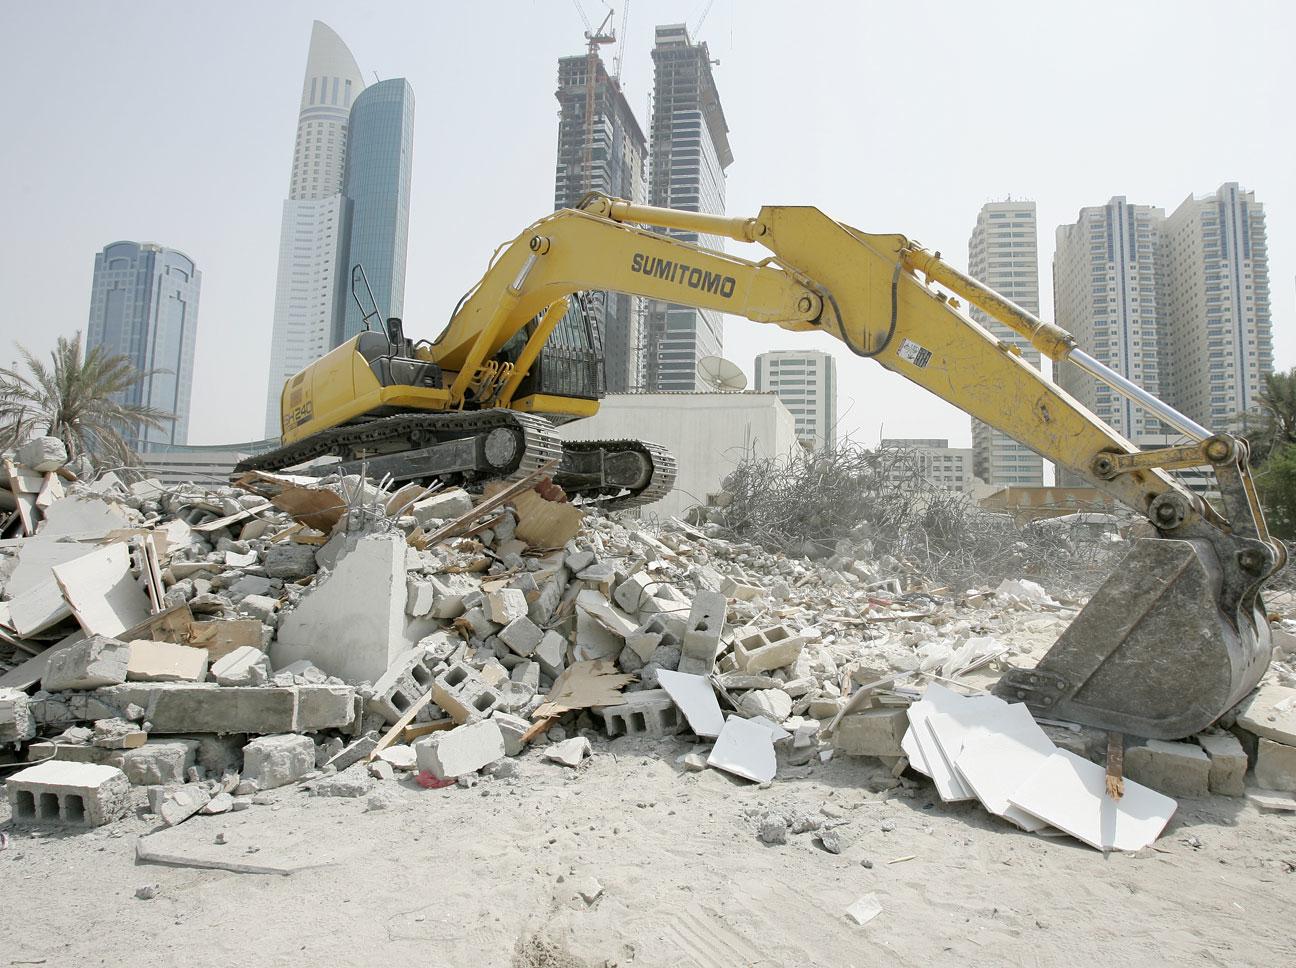 S & S Demolition